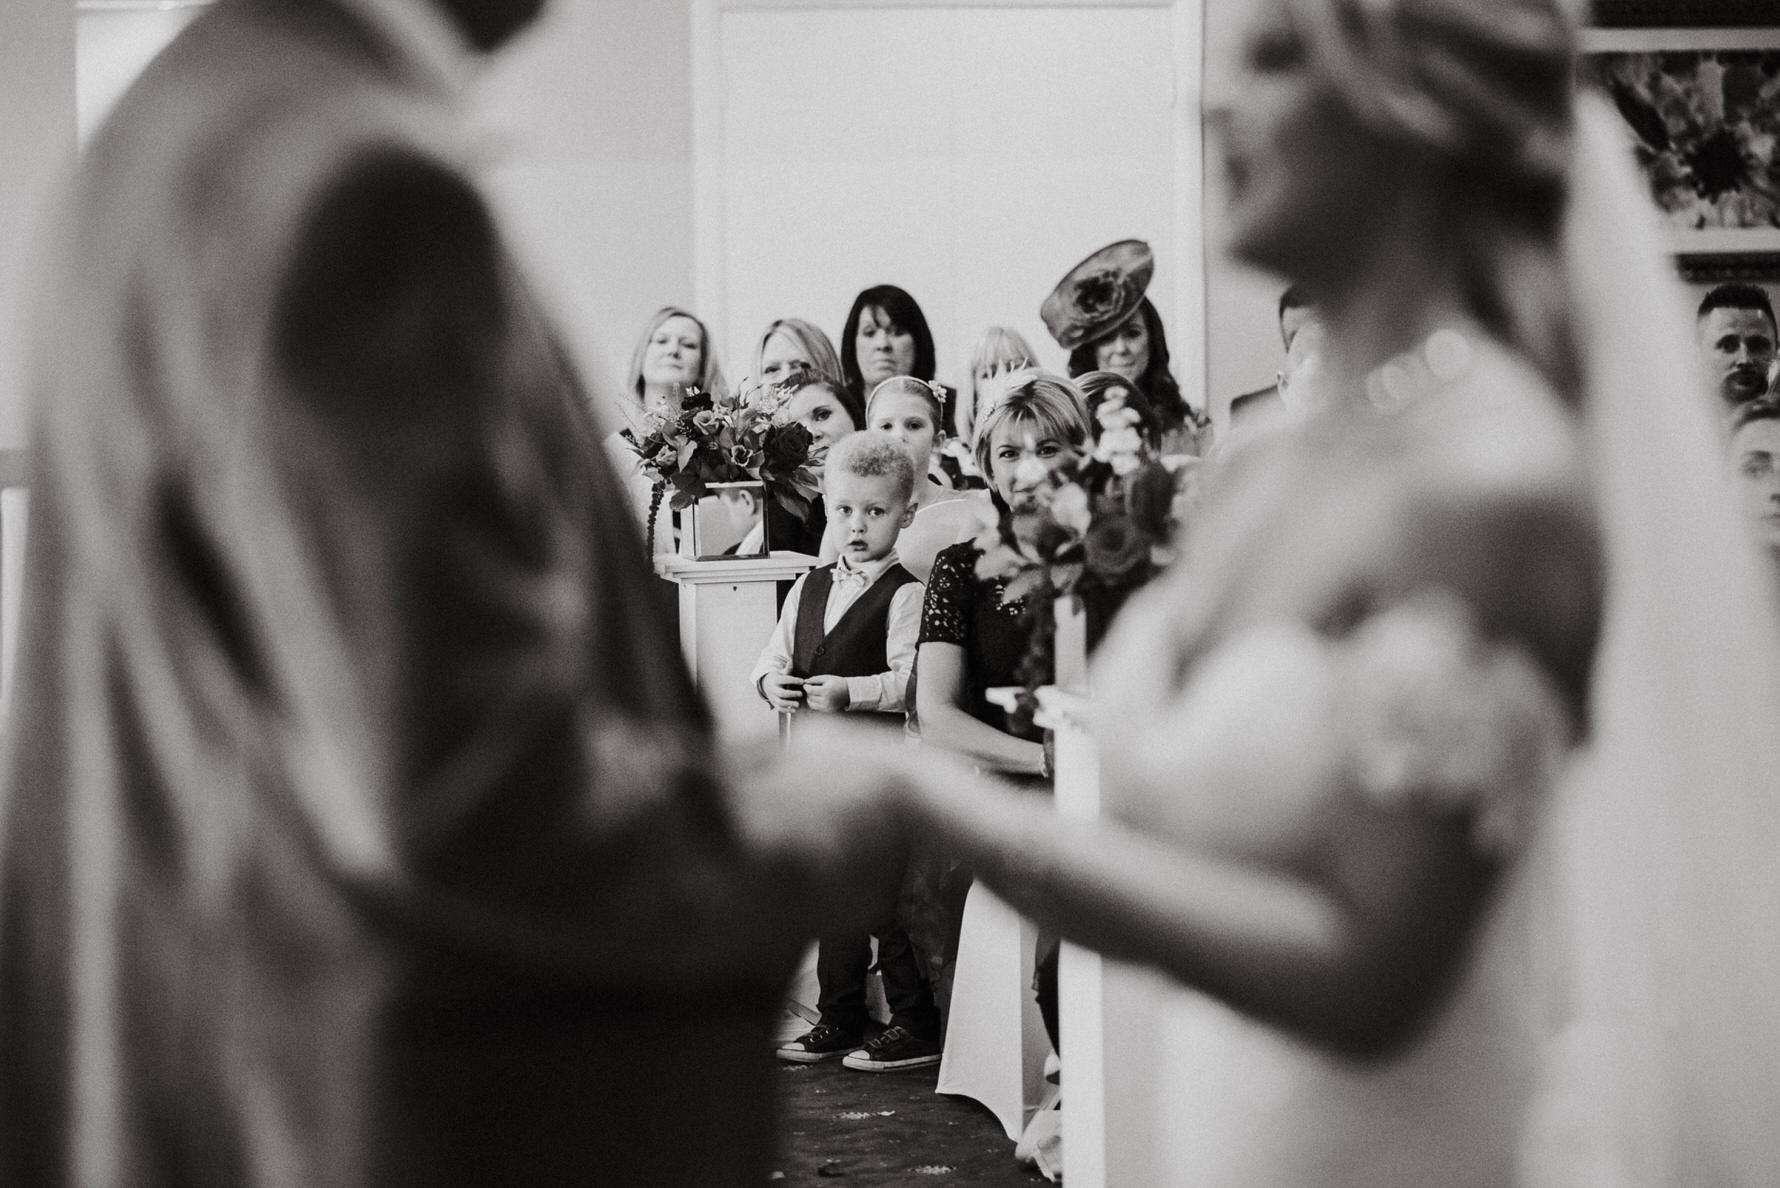 Cheshire Wedding photography wedding ceremony